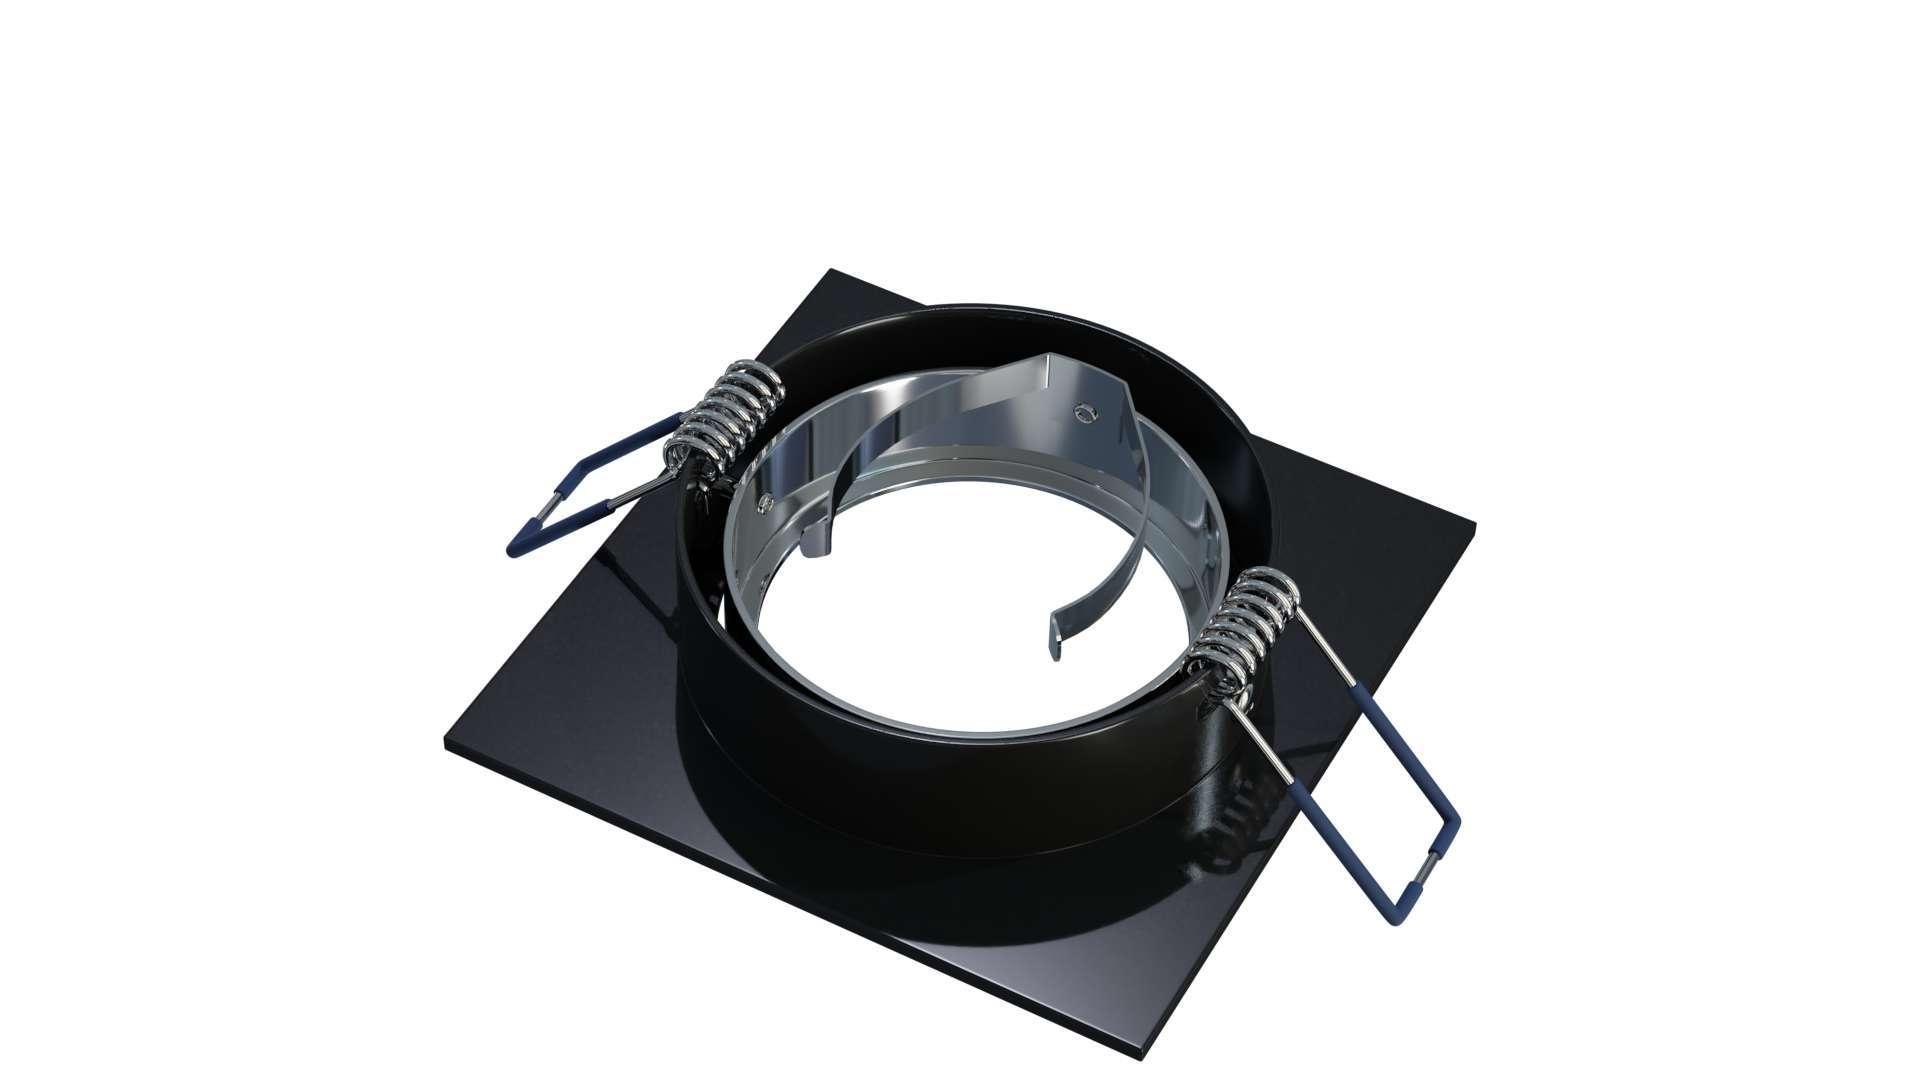 Oprawa GABI kwadrat ruchoma czarna szczot.